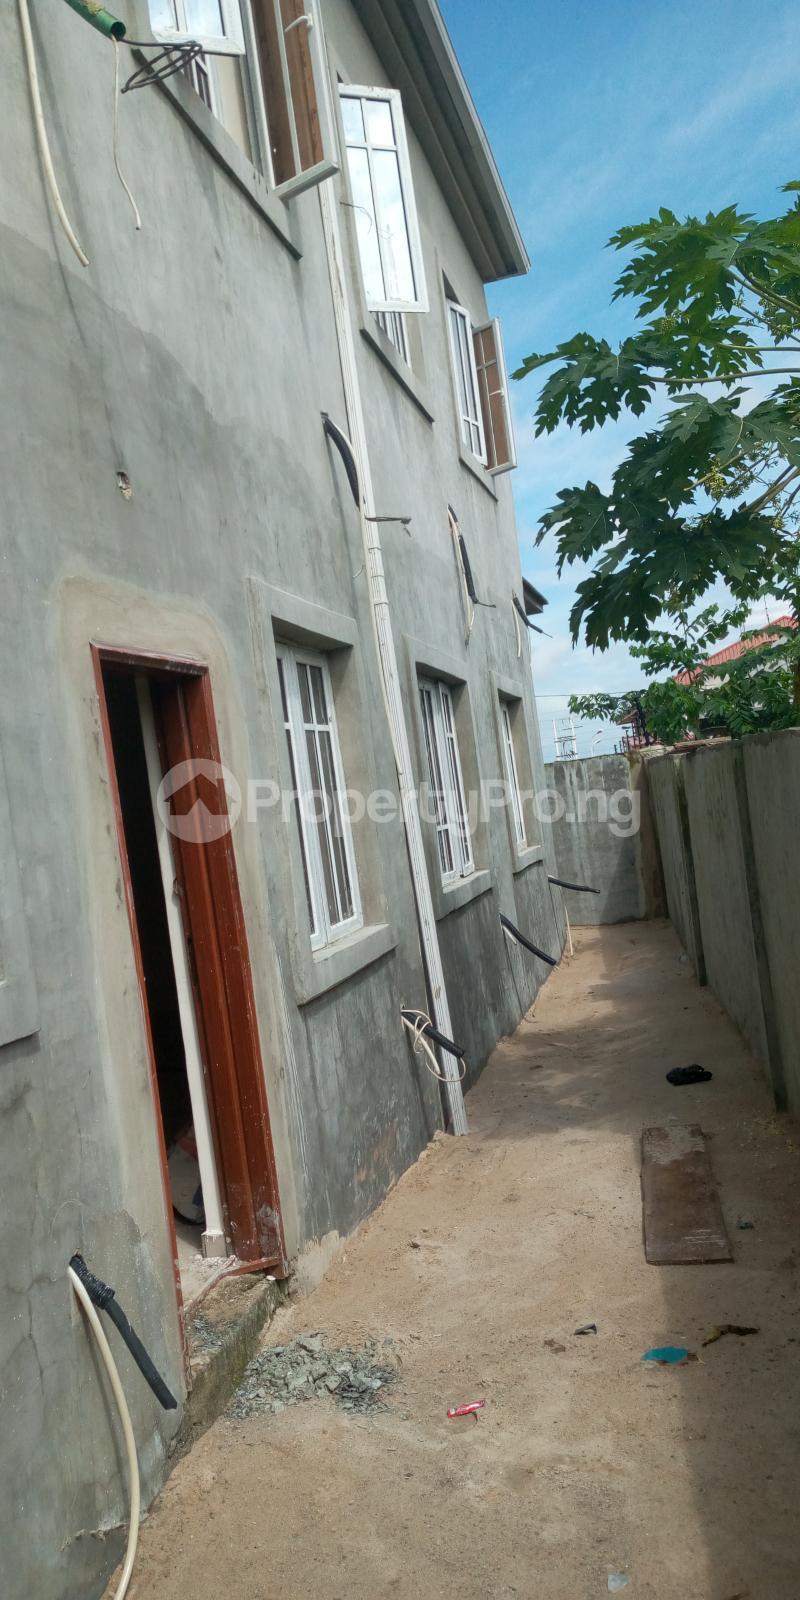 School Commercial Property for sale Eputu Ibeju-Lekki Lagos - 4